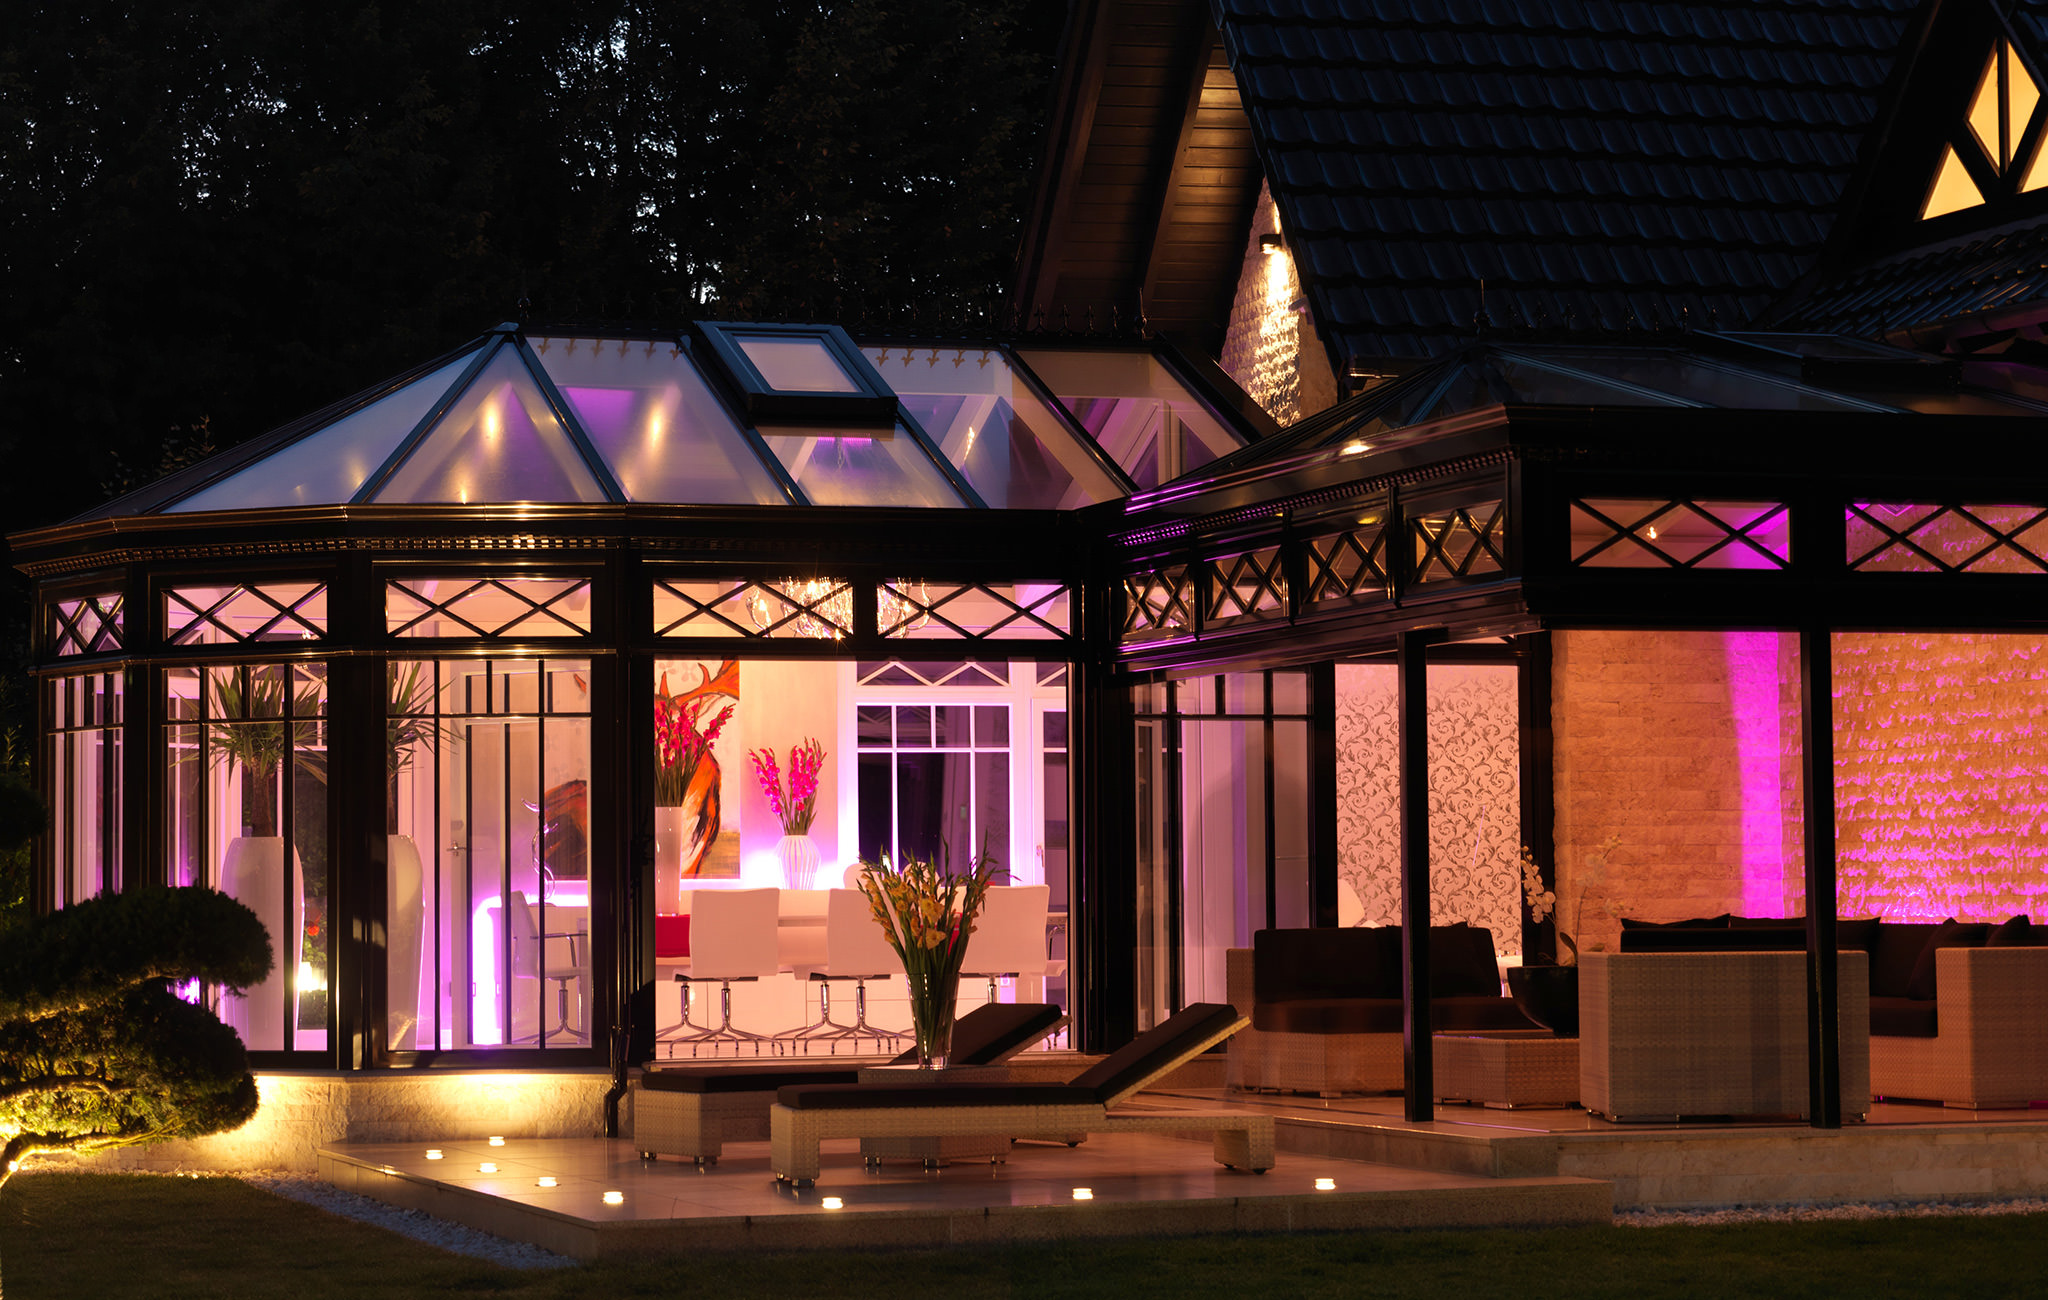 wintergarten beleuchtung krenzer wintergarten ratgeber. Black Bedroom Furniture Sets. Home Design Ideas